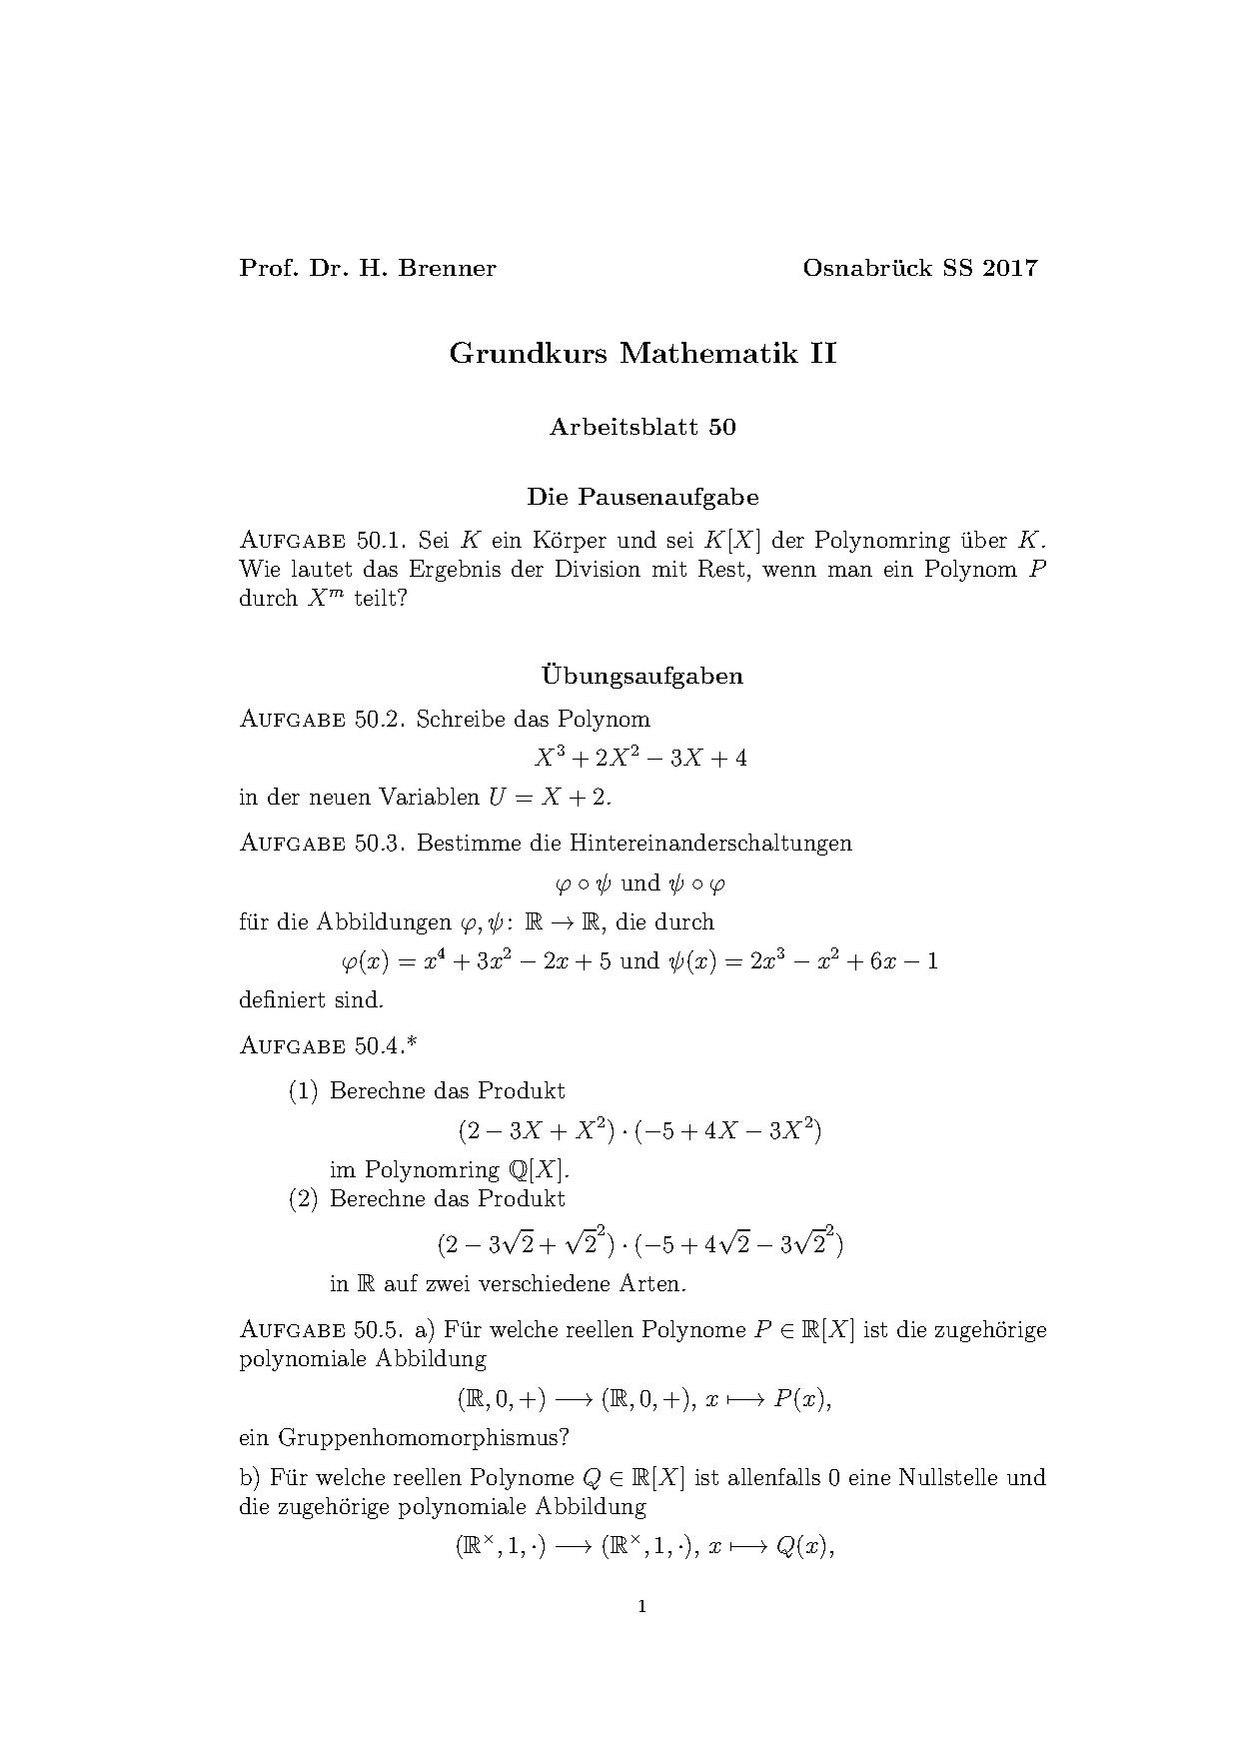 Atemberaubend Polynome Arbeitsblatt Pdf Galerie - Mathe Arbeitsblatt ...